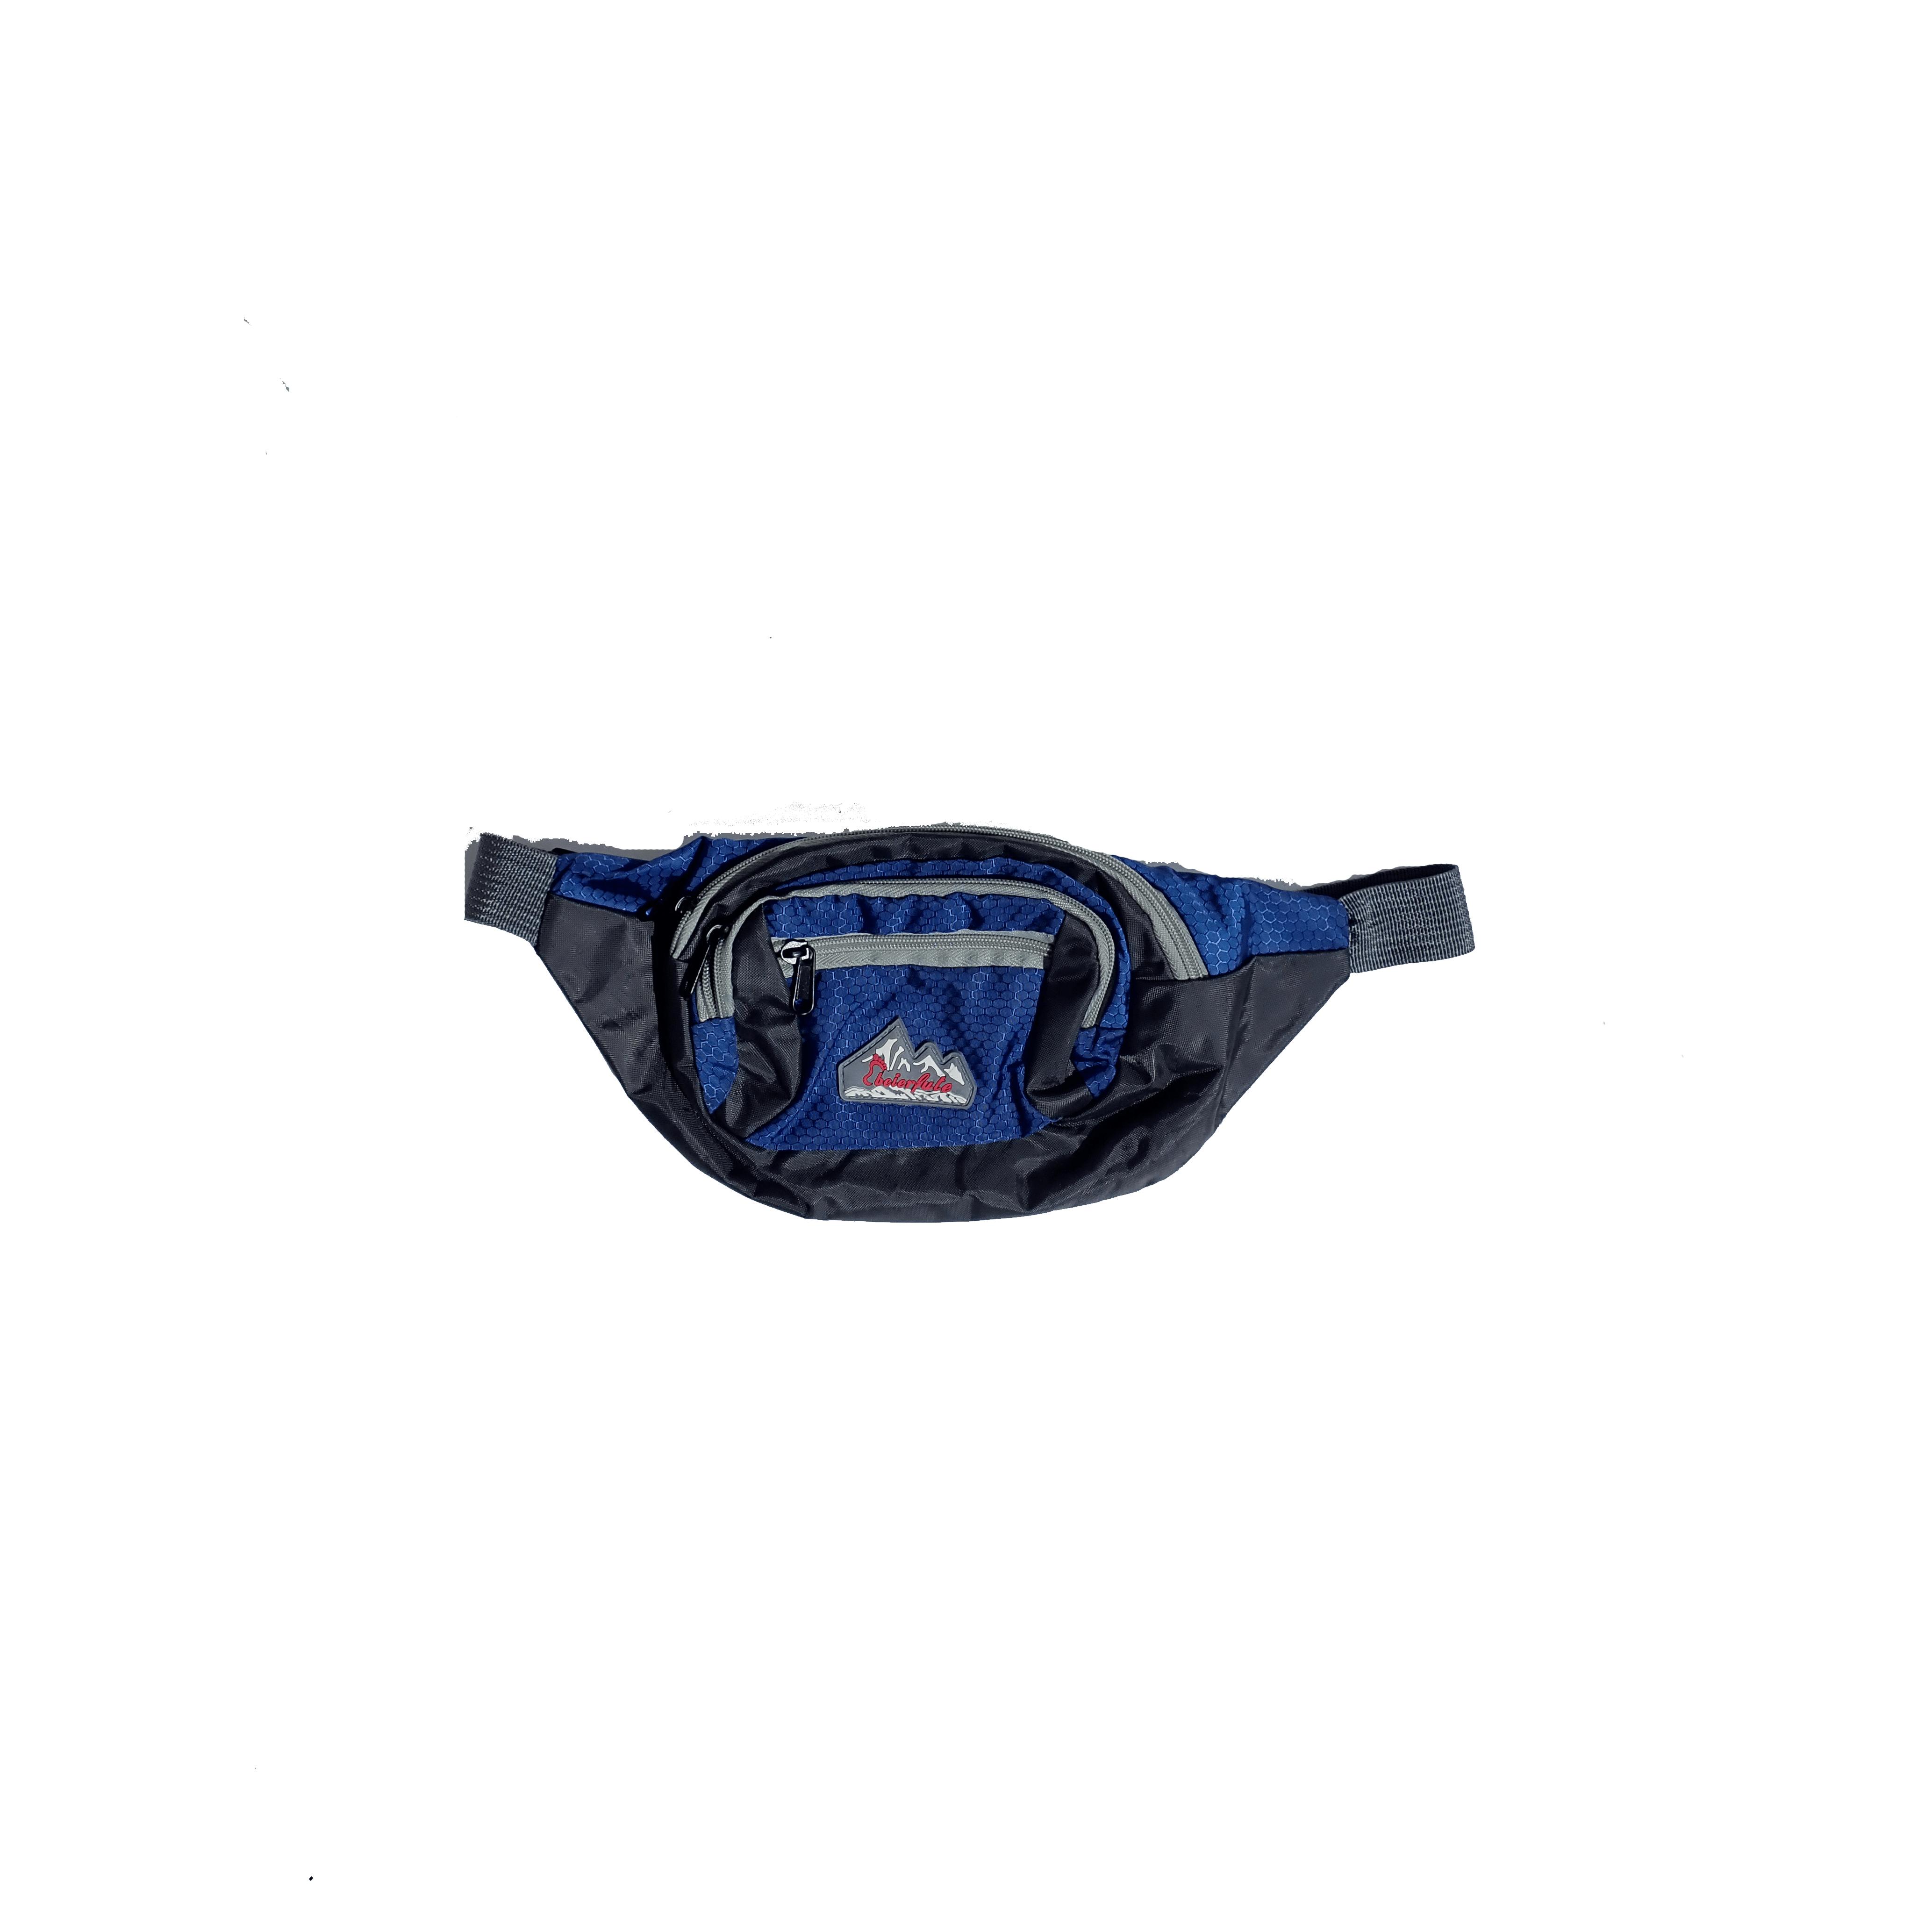 Beierfute Bag